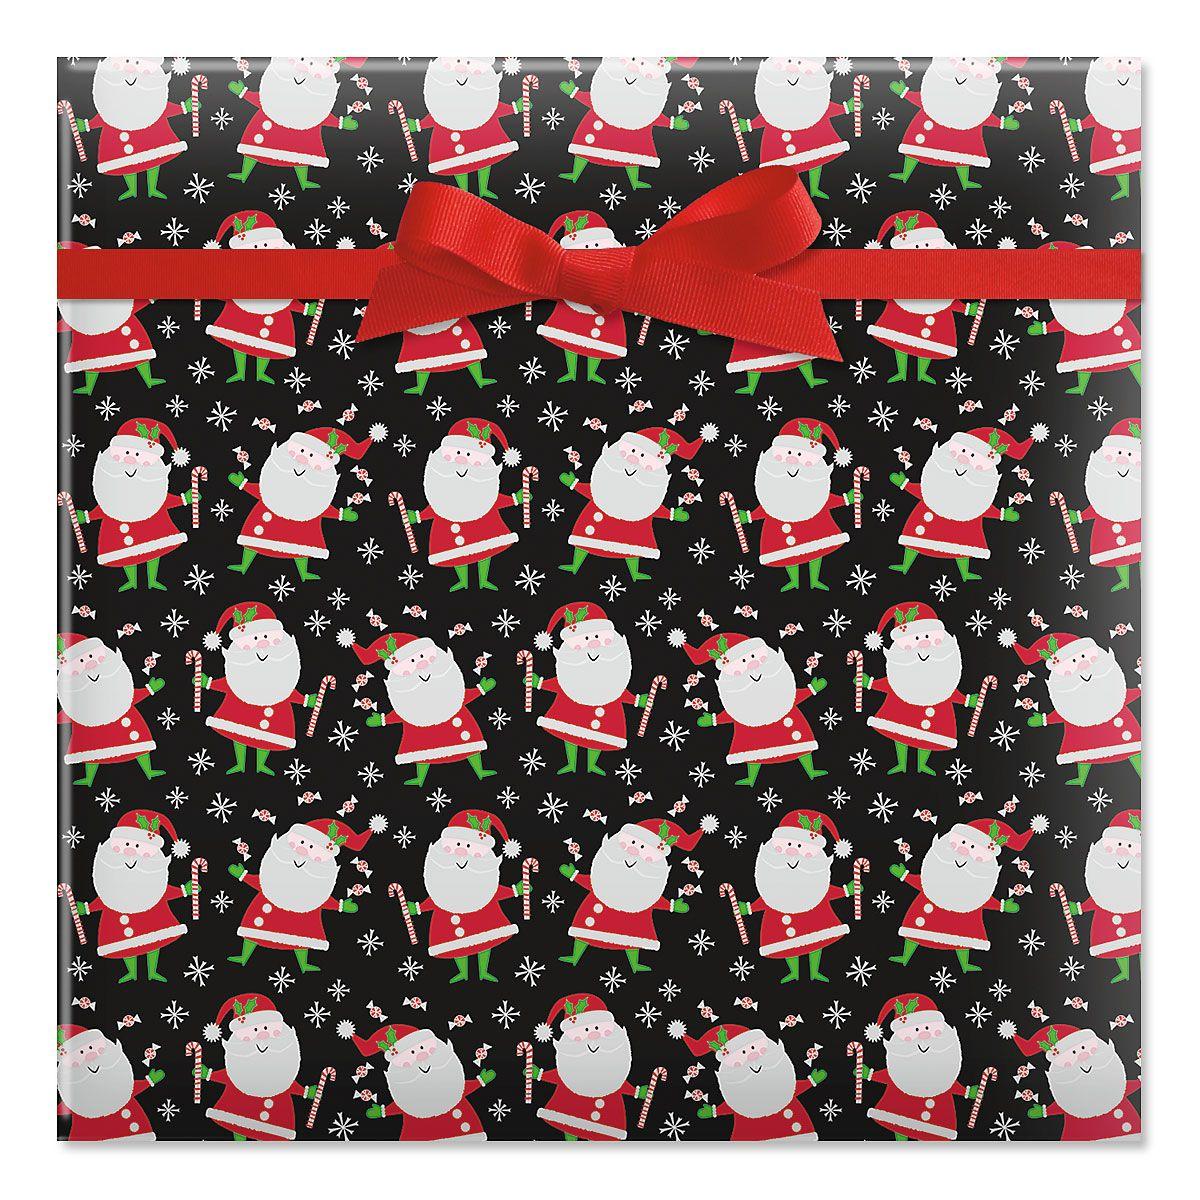 Santa's Sweets Jumbo Rolled Gift Wrap